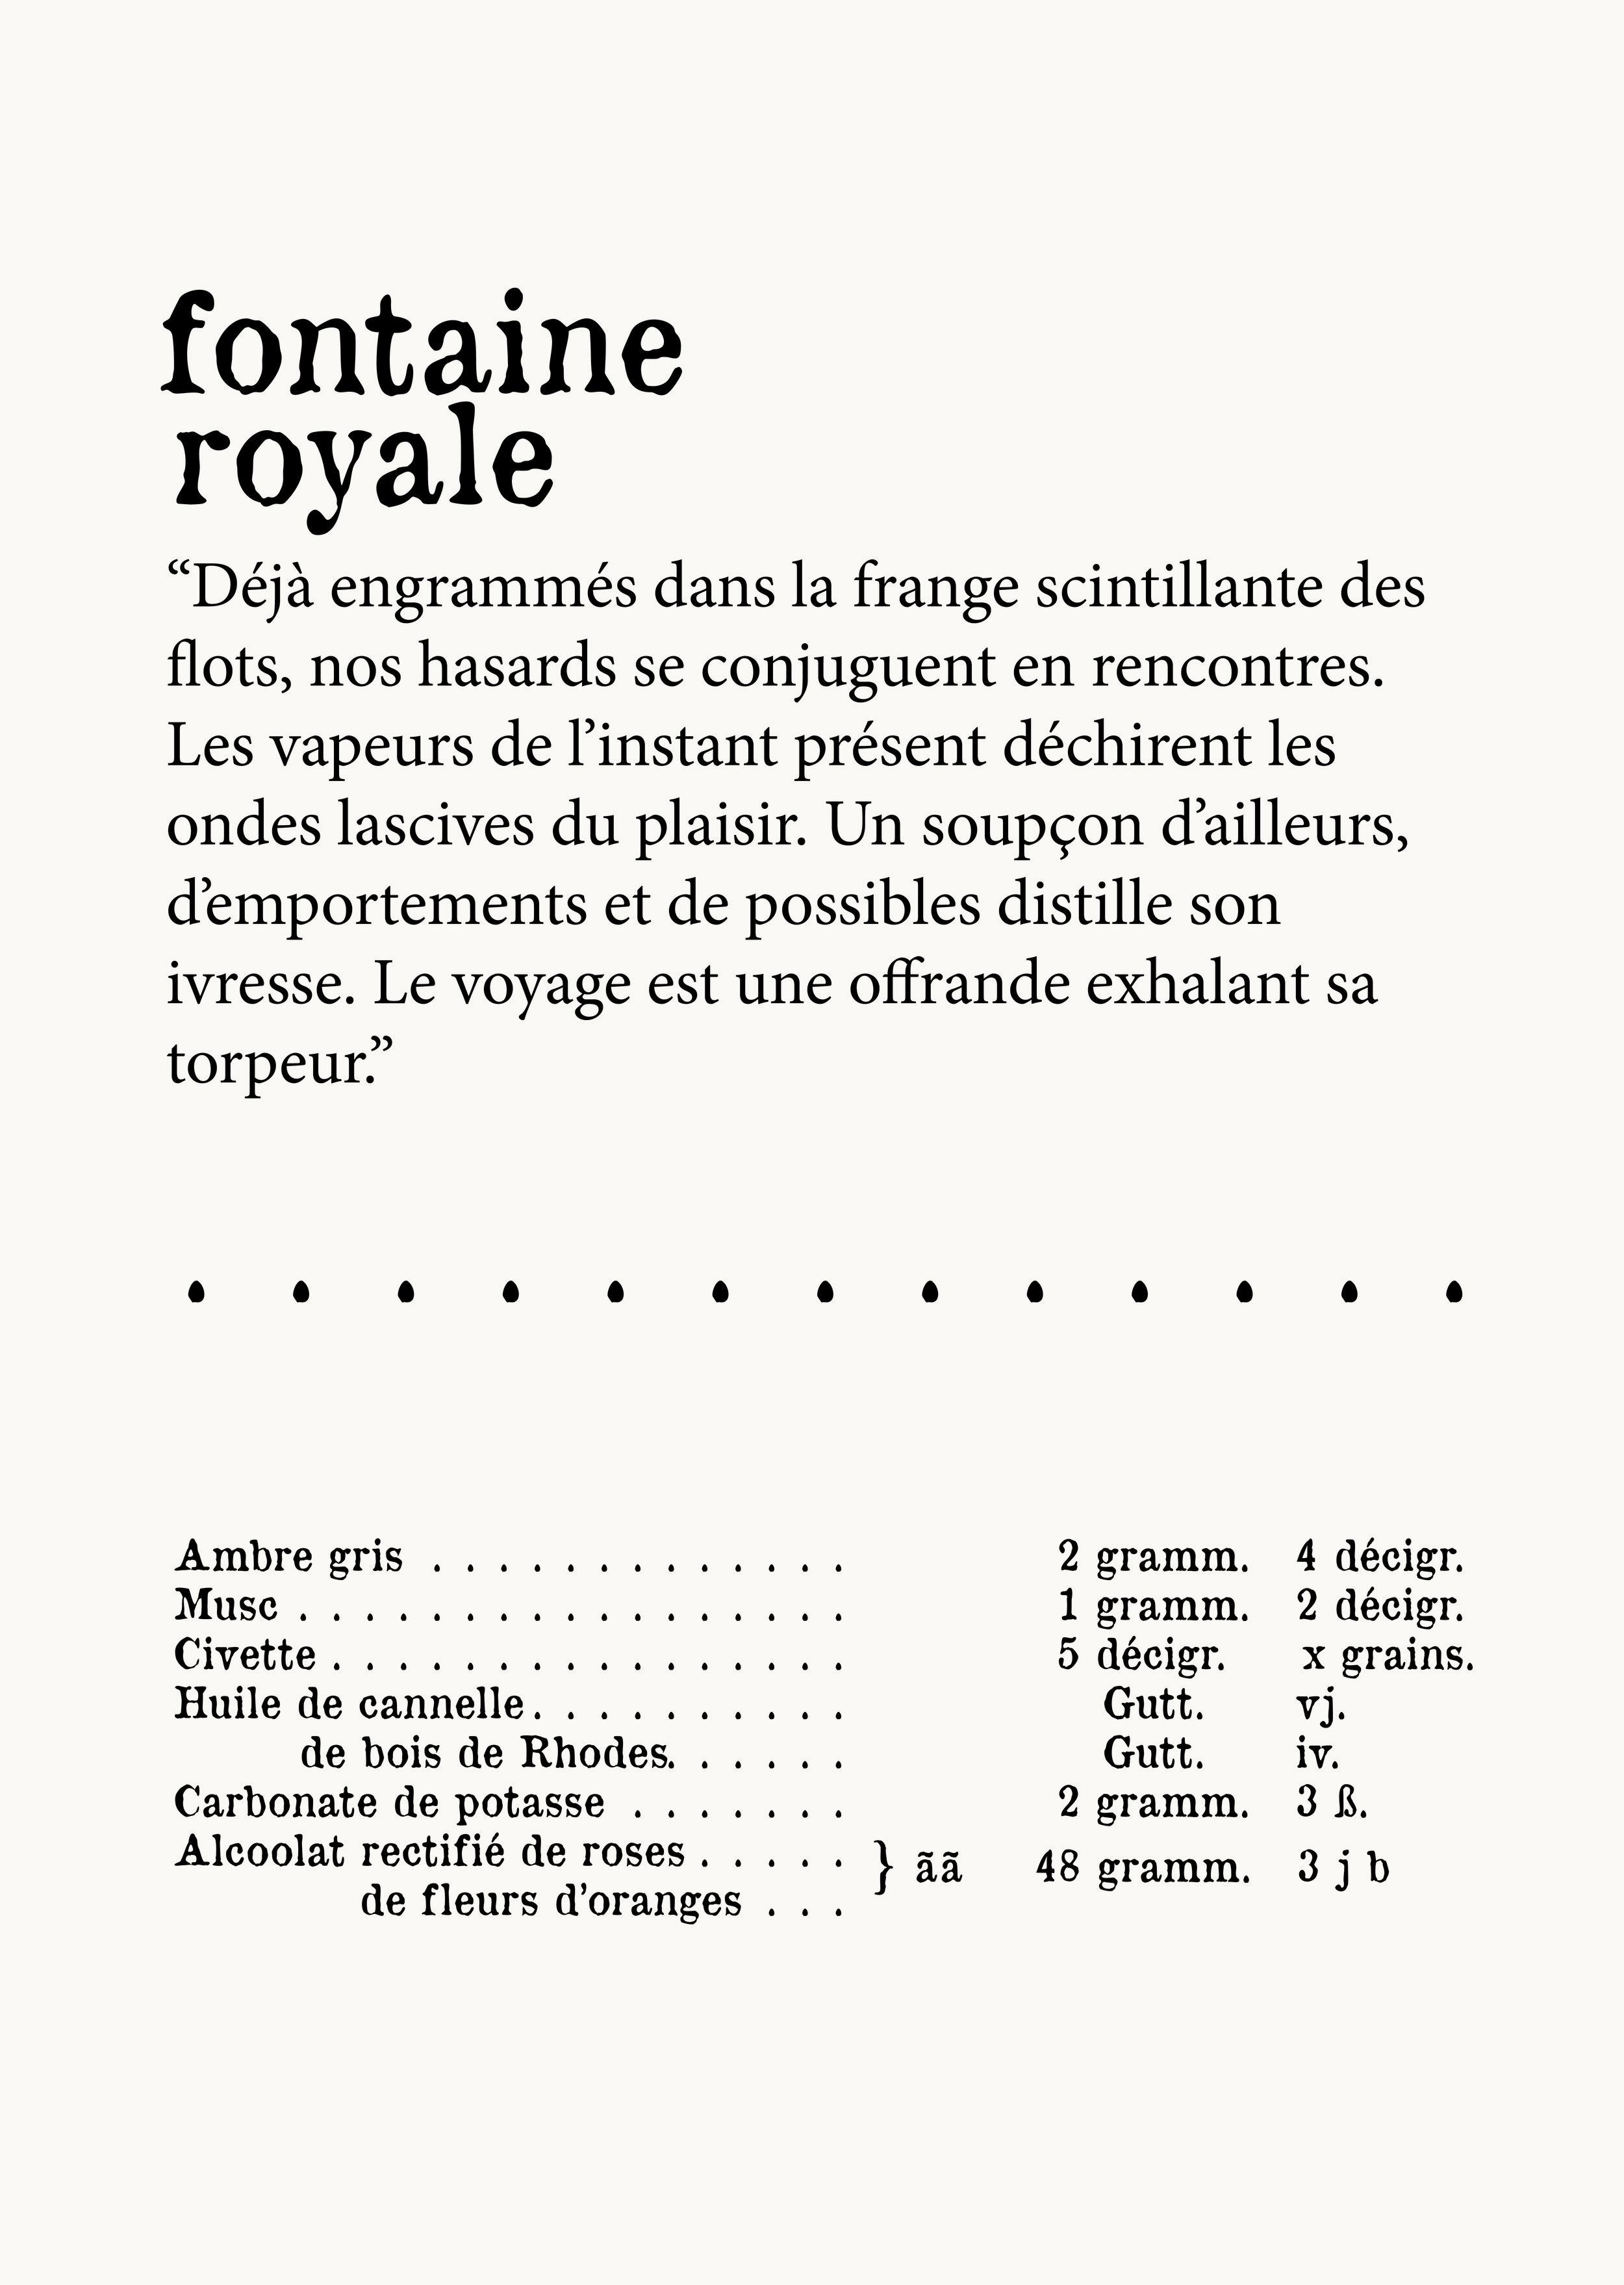 website fontaine royale fr.jpg